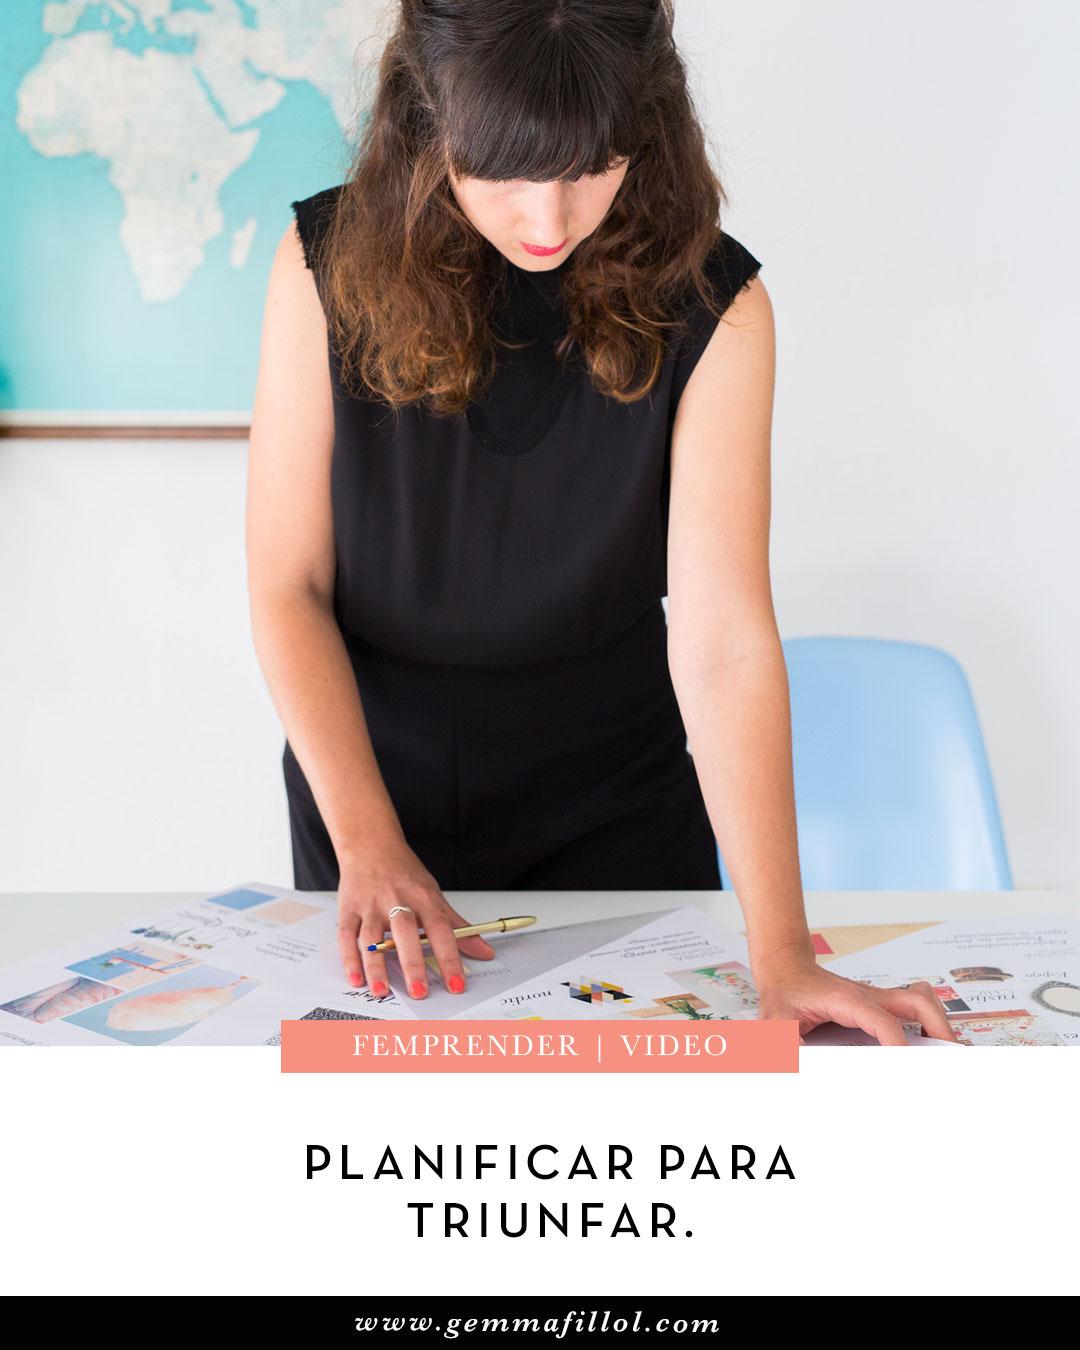 PLANIFICAR_PARA_TRIUNFAR